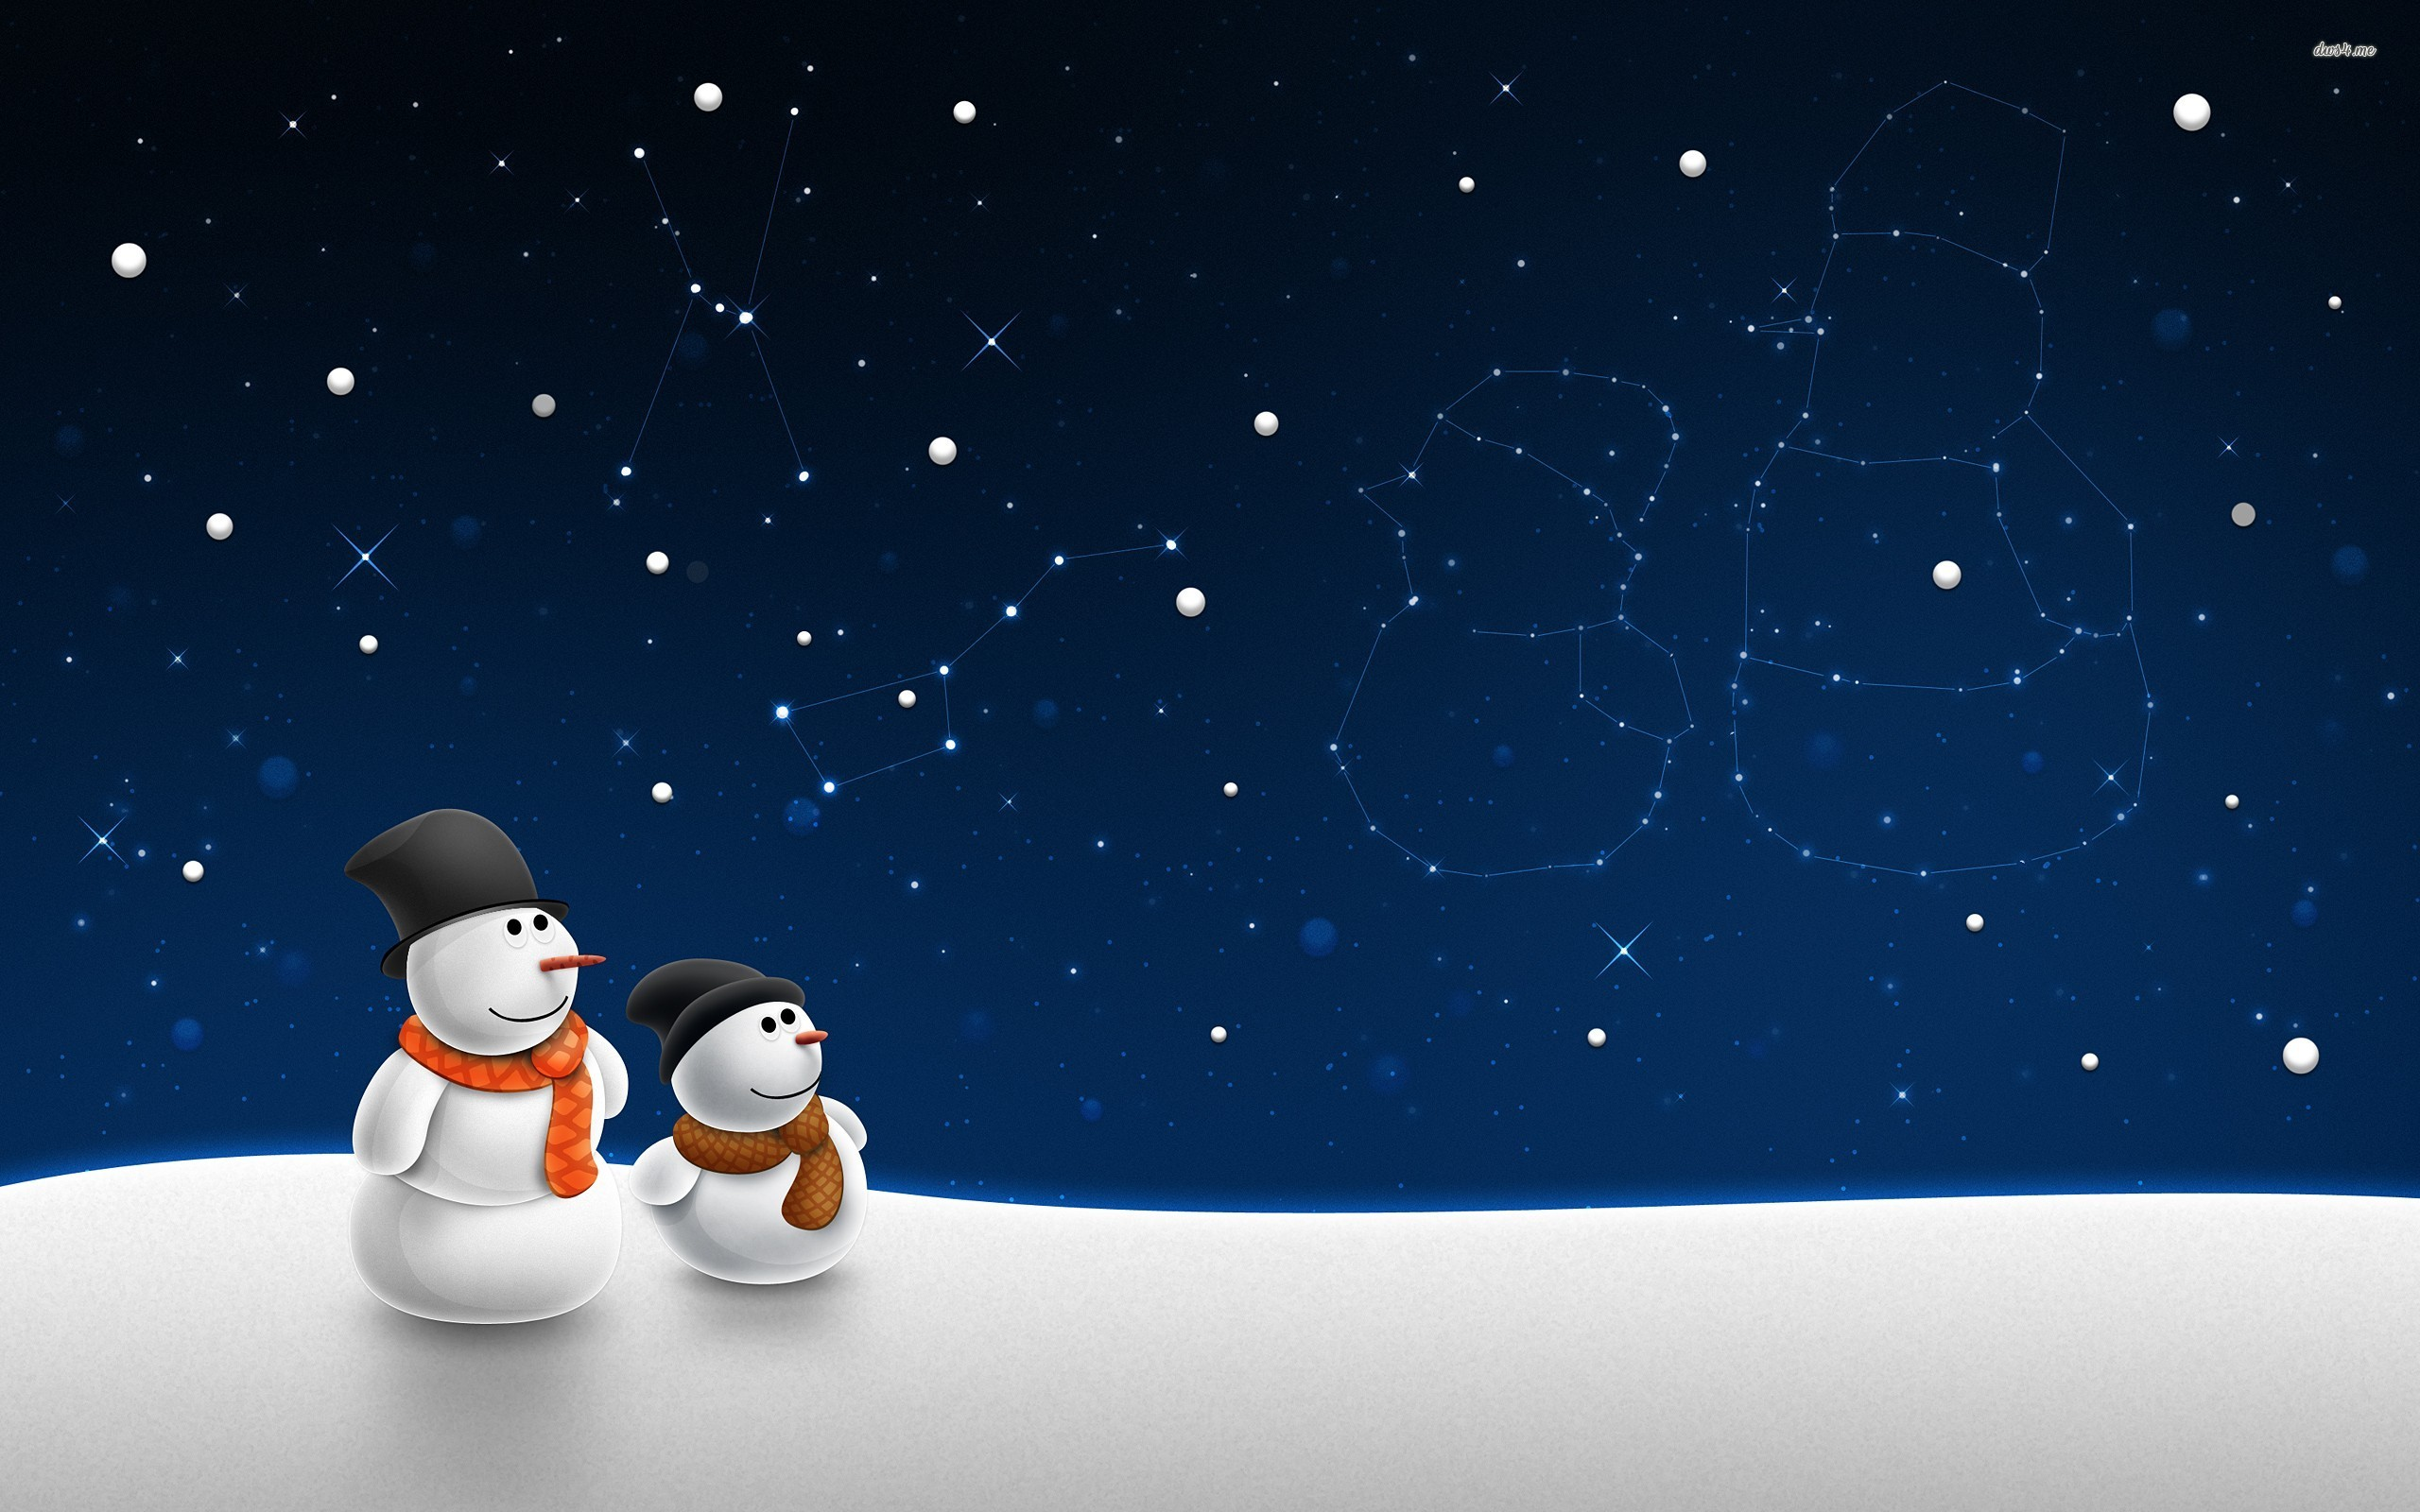 Snowman Wallpaper 2560x1600 47307